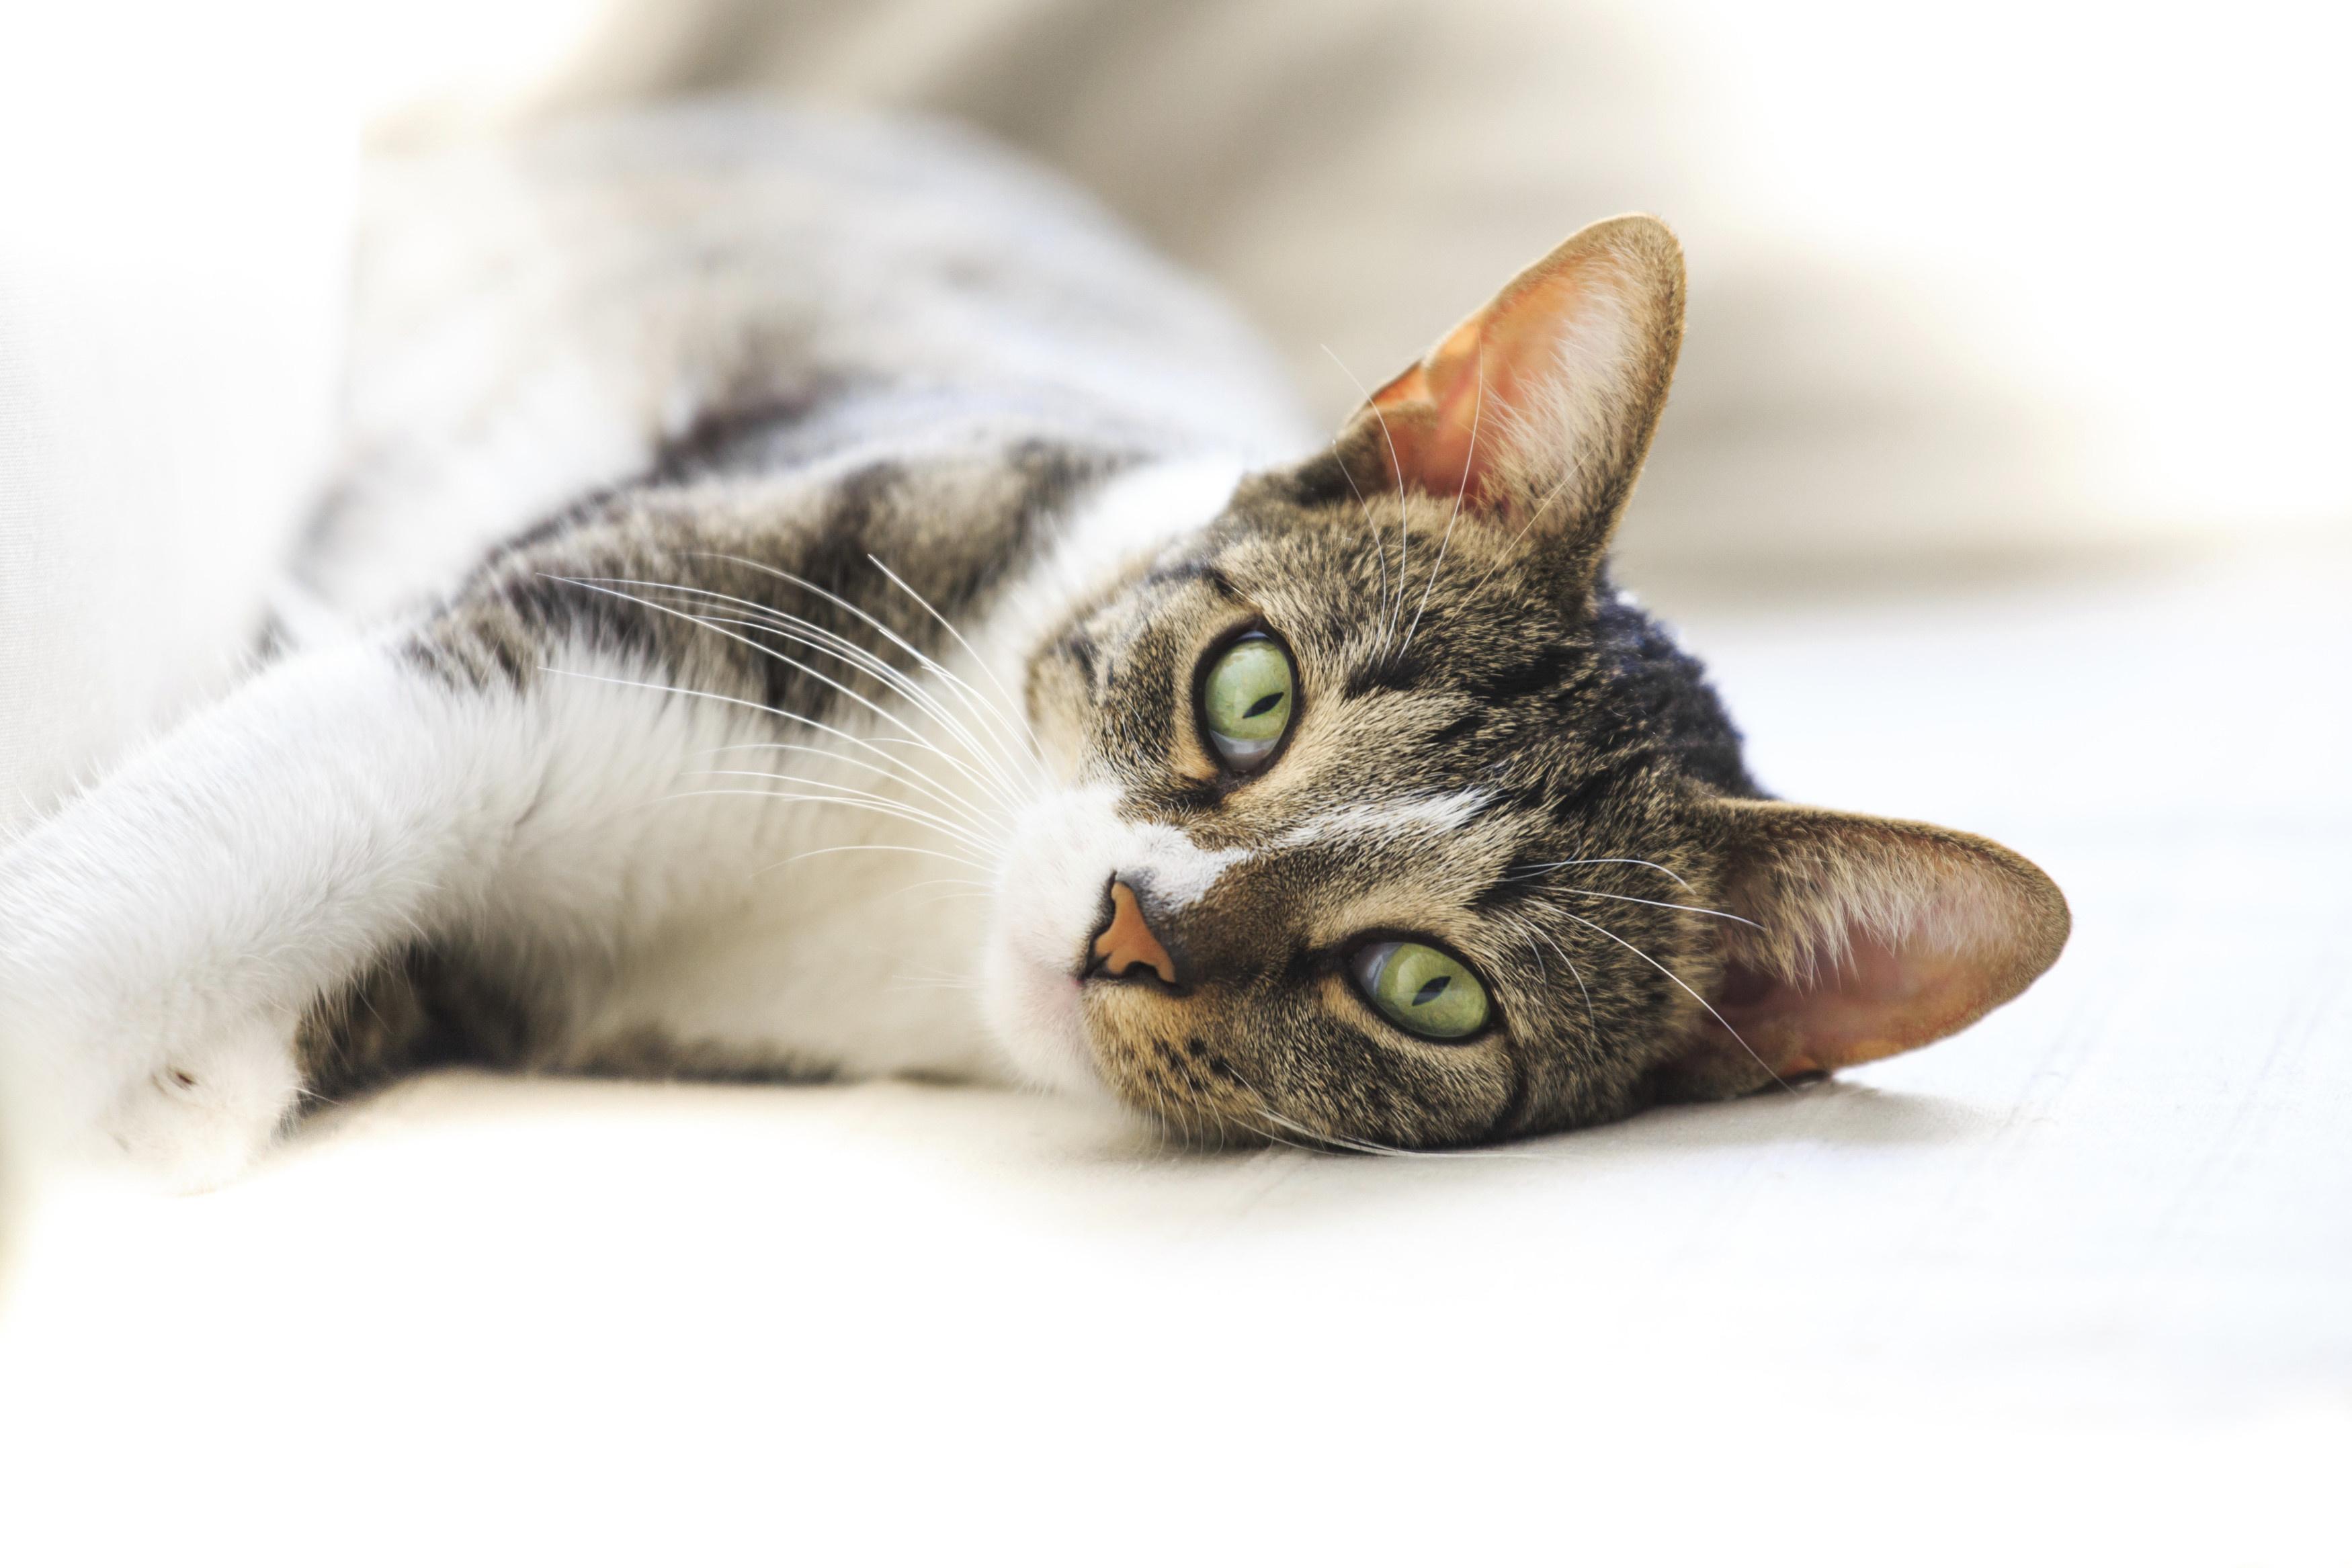 Katzenallergie hilfe asthma bei Katzenallergie: Was